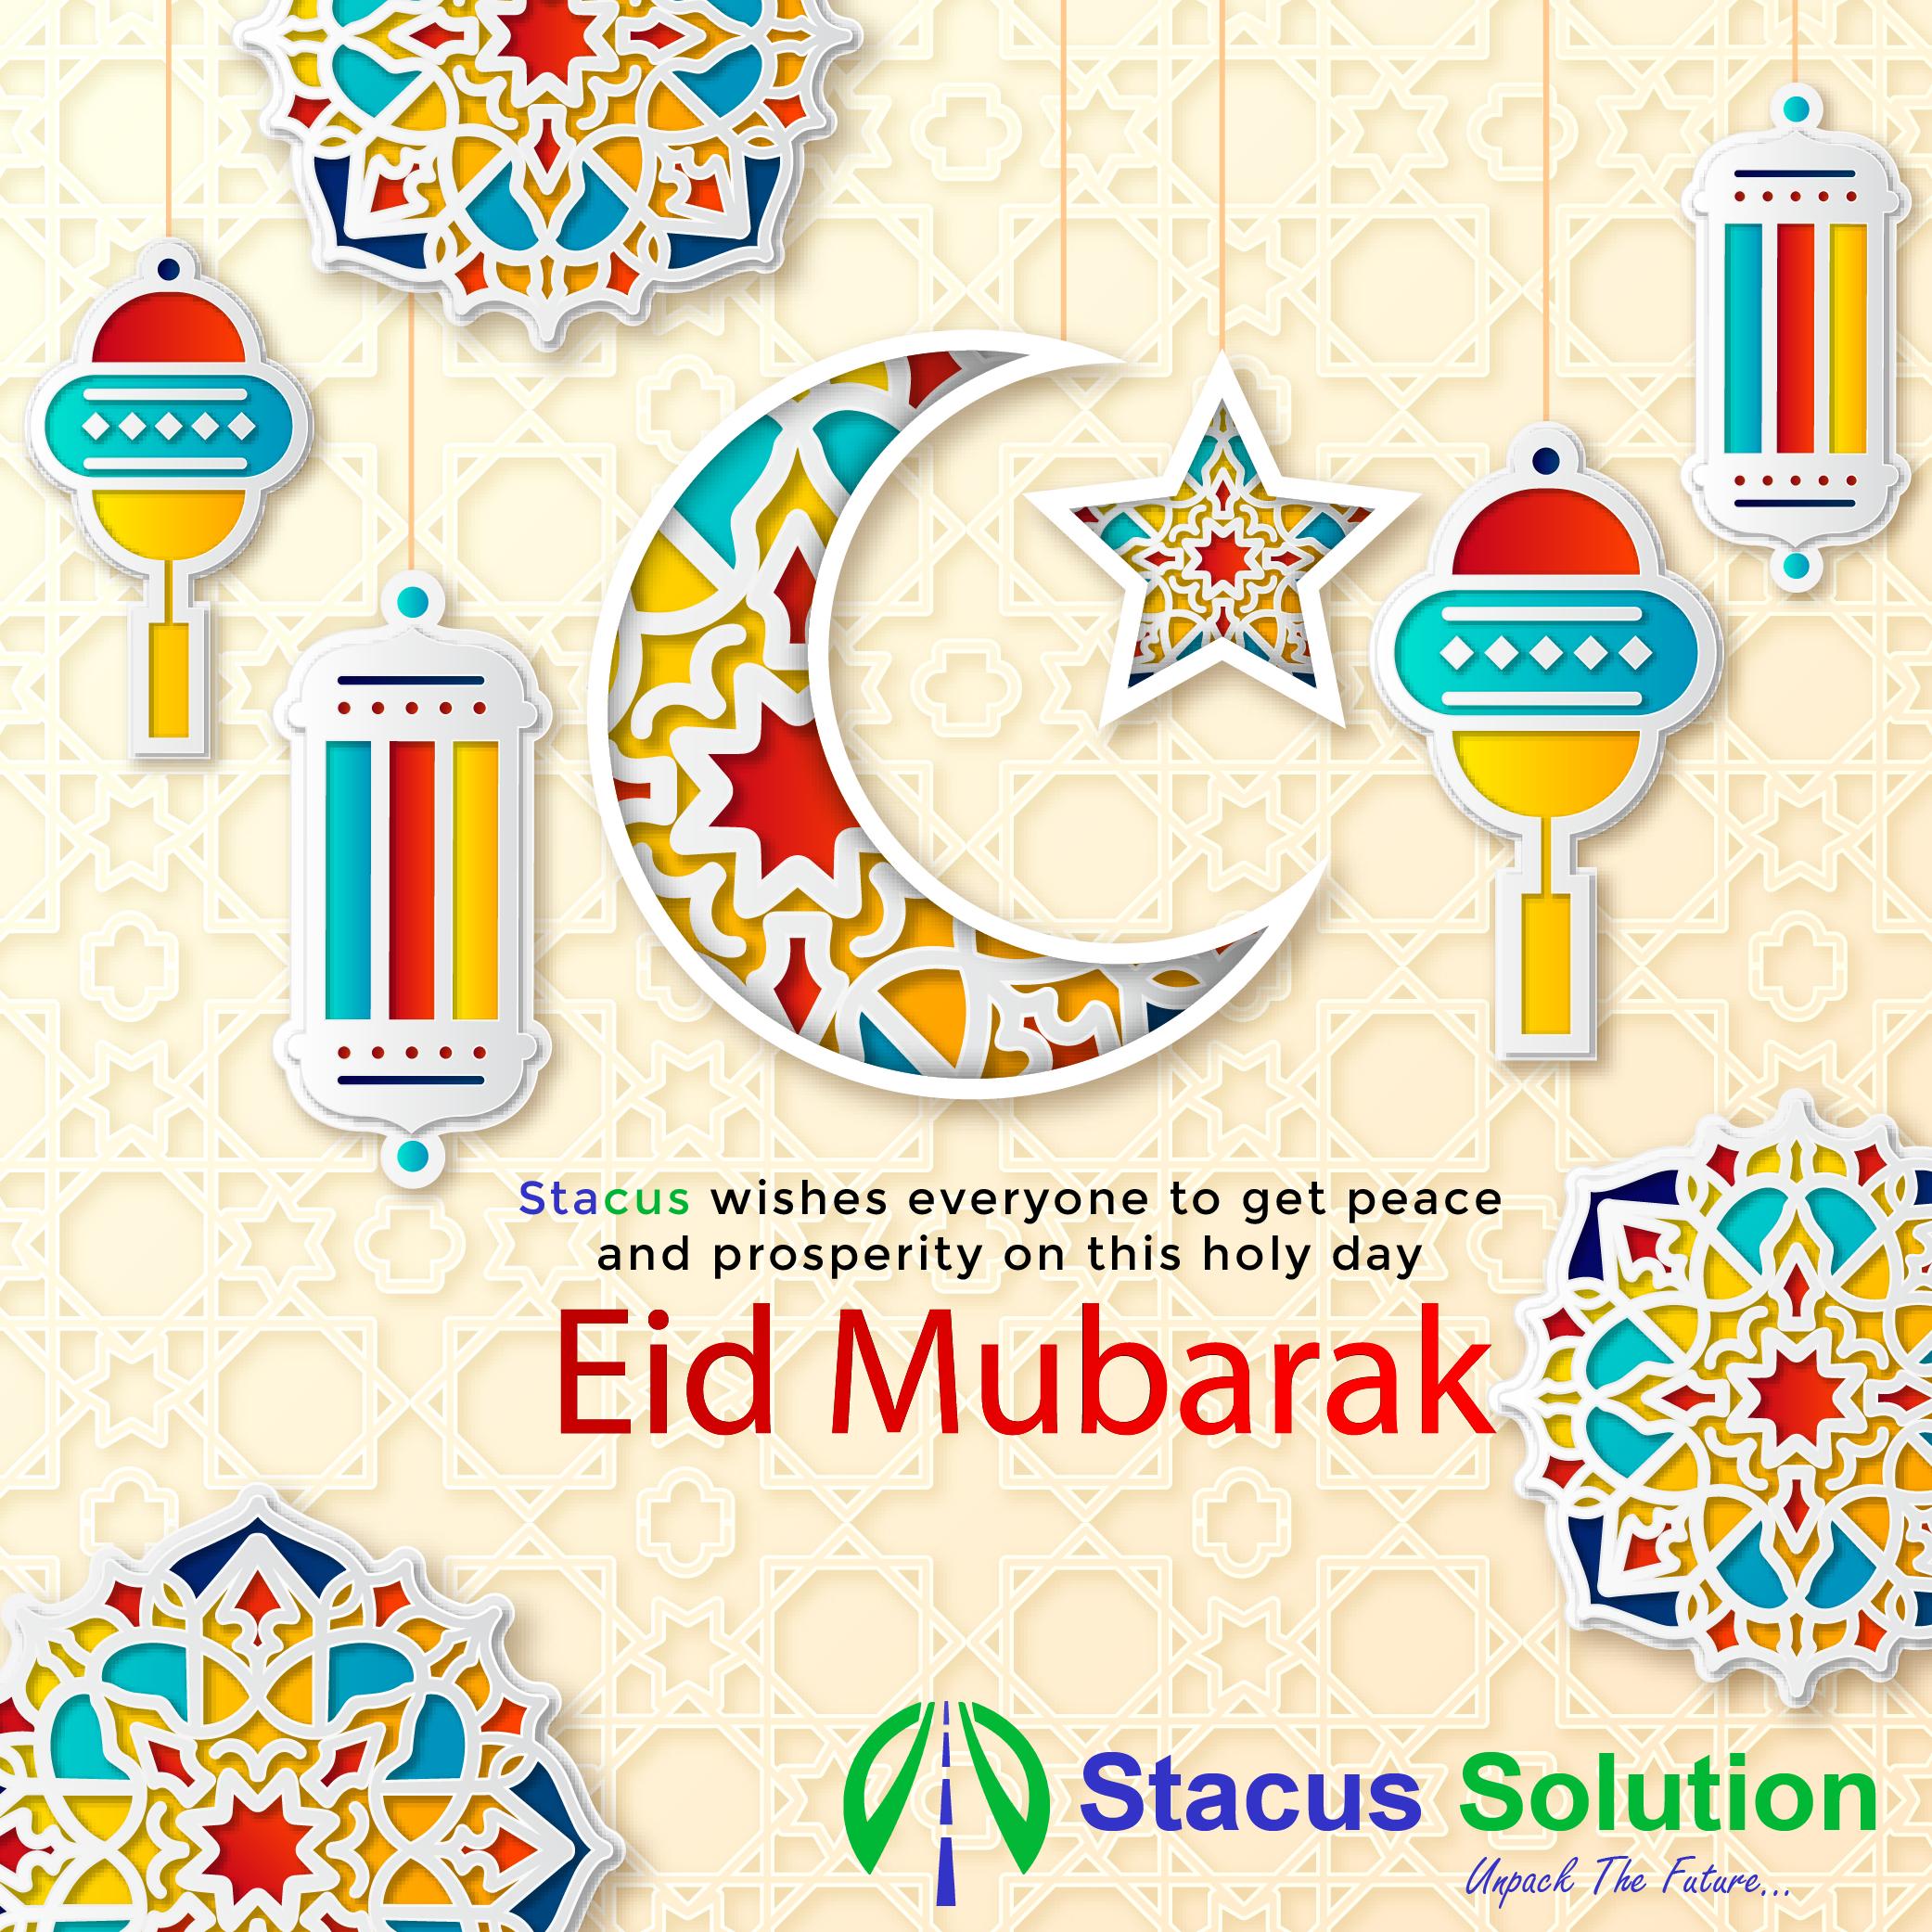 stacus.com wishes Eid Mubarak!  May this pious day brings you immense #joy, happiness, #peace and #prosperity.    #EidMubarak #EidAlFitr #eidmubarak2020 #EidMubark #Eid2020 #EidUlFitrMubarak #Mubarak #Ramadhan #Ramzan2020 #ramzanmubarak #HappyEid #HappyEid2020